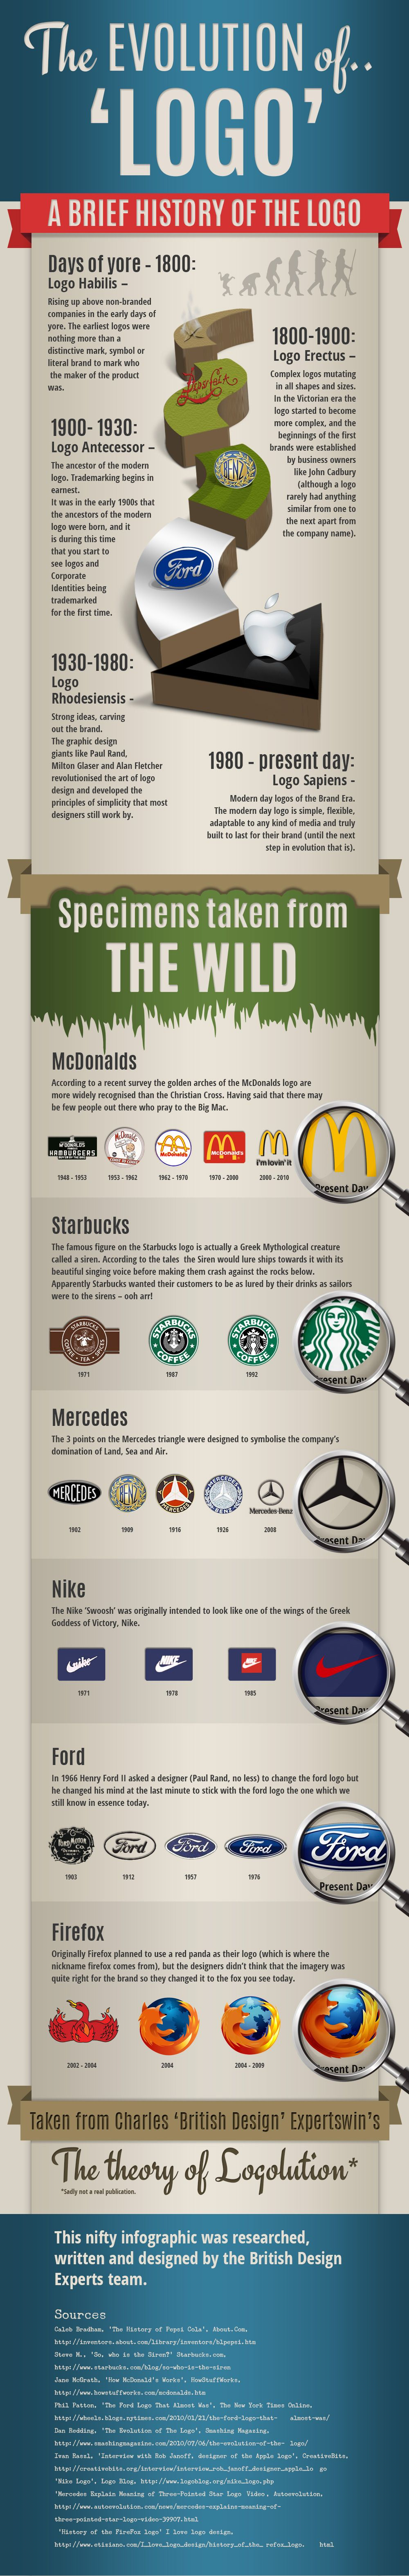 The history of #logo